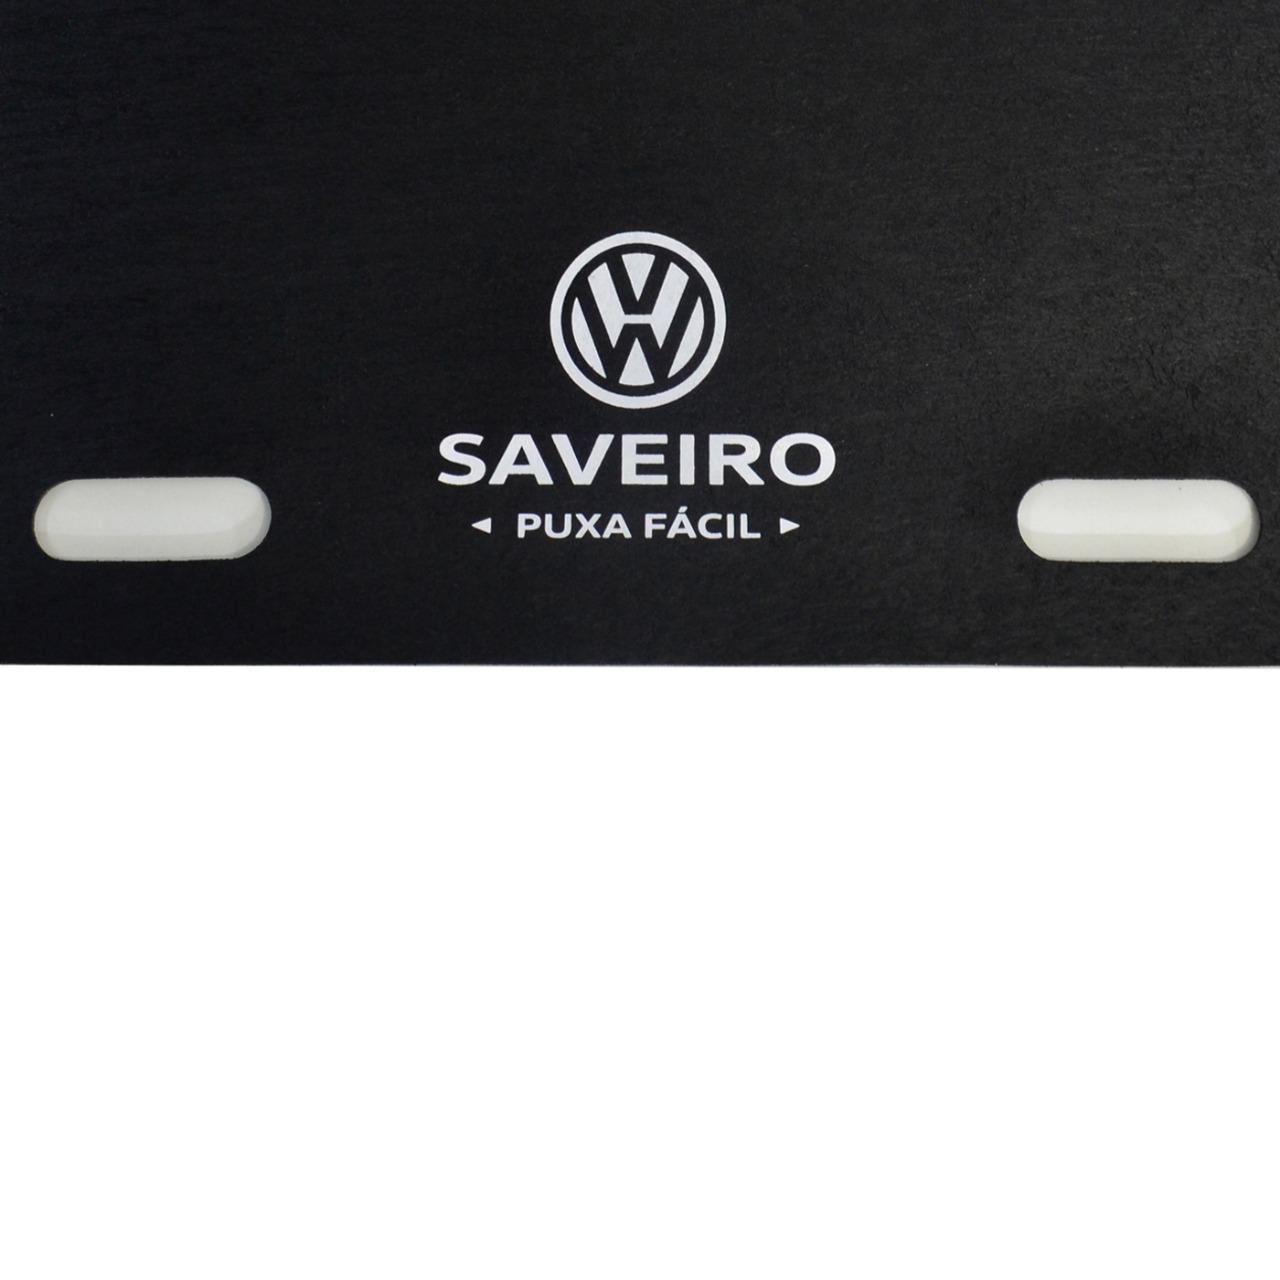 Tapete de Caçamba Puxa Fácil Volkswagen Saveiro G5 Cabine Dupla 2009 á 2020 Titanium PF-0203